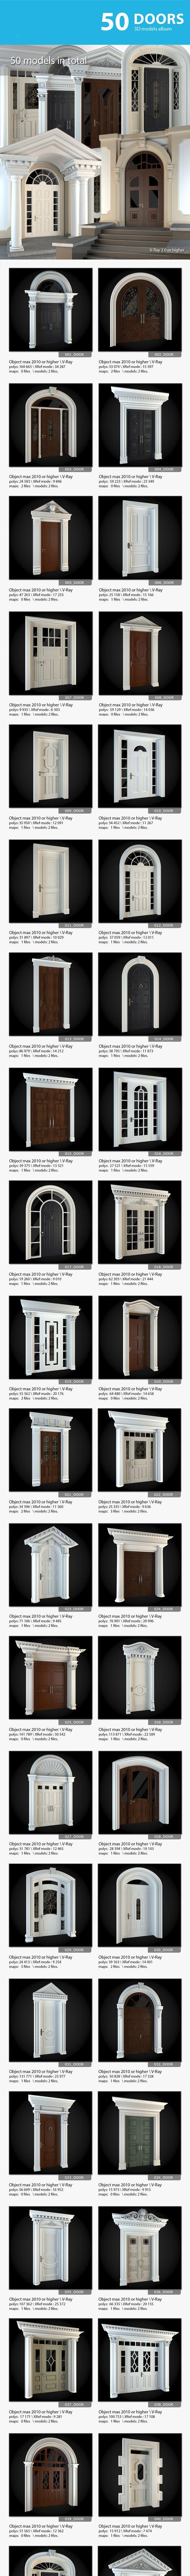 Doors Collection - 3DOcean Item for Sale